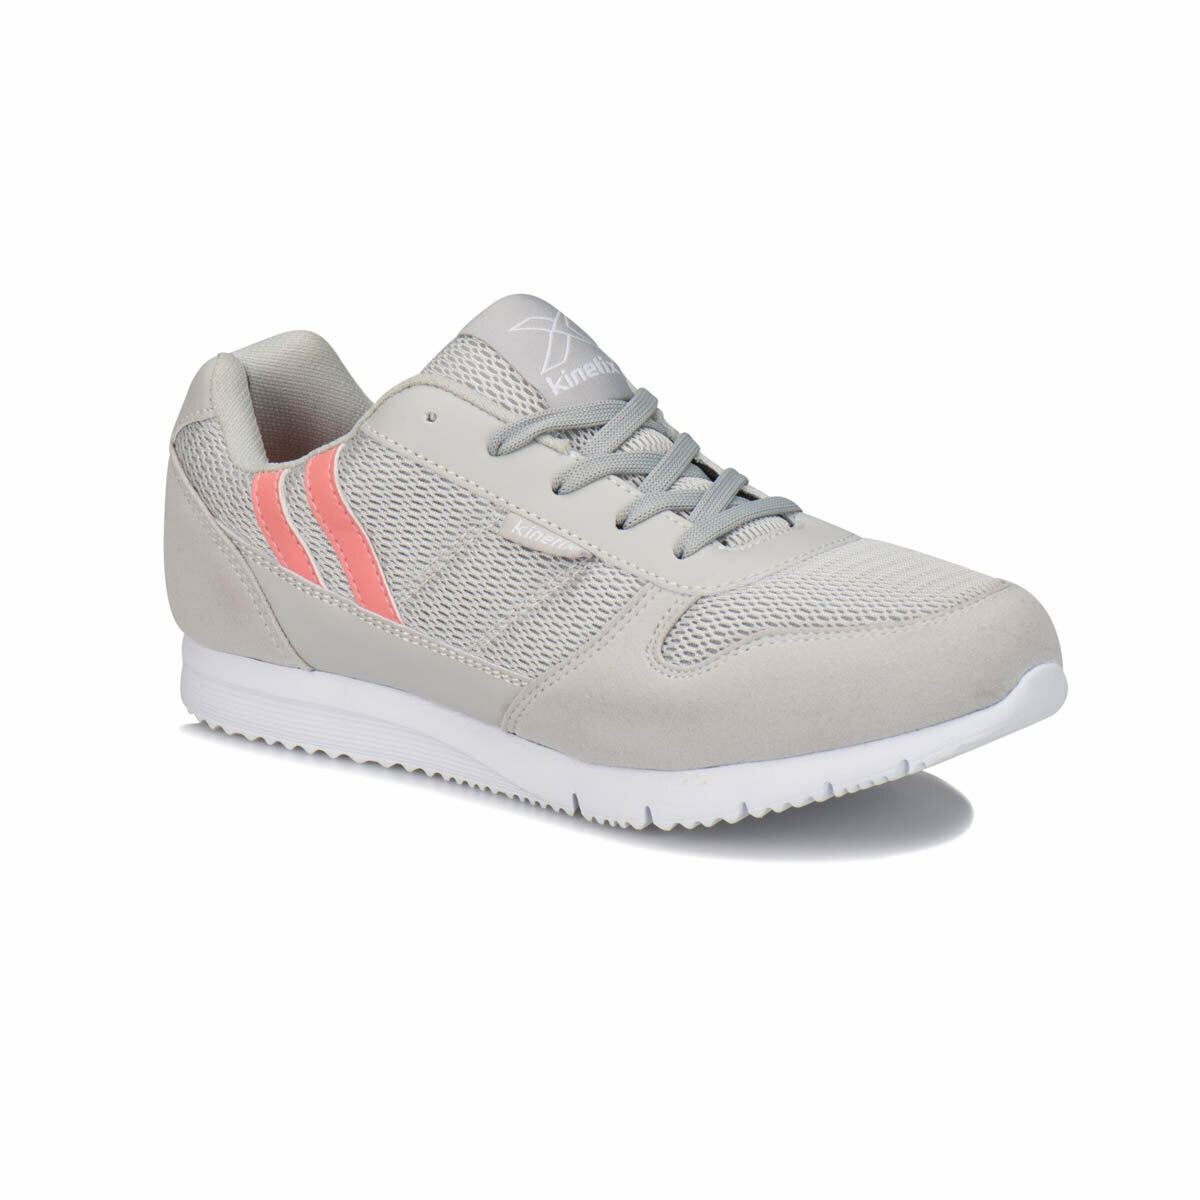 FLO CORDELIA MESH Light Gray Women 'S Sneaker Shoes KINETIX